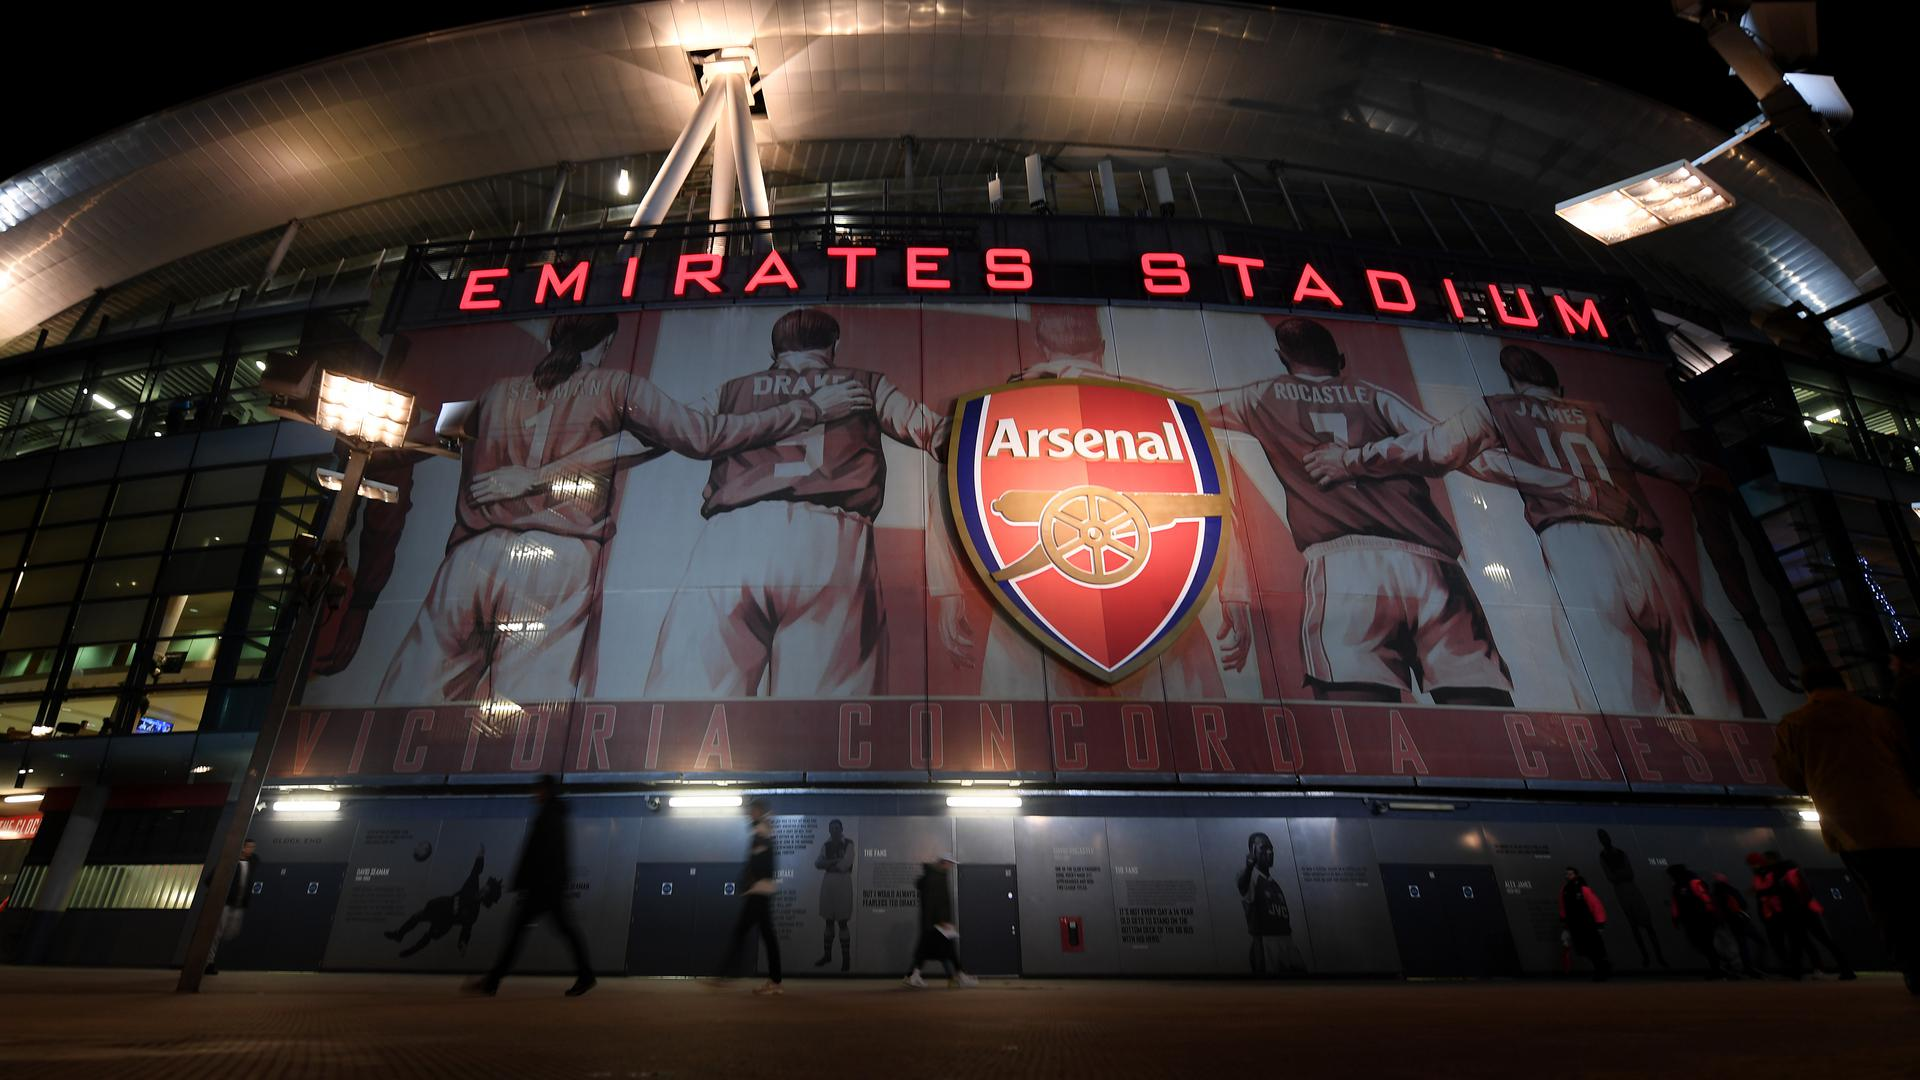 Arsenal v Man Utd pre match info 1 January 2020 Manchester United 1920x1080